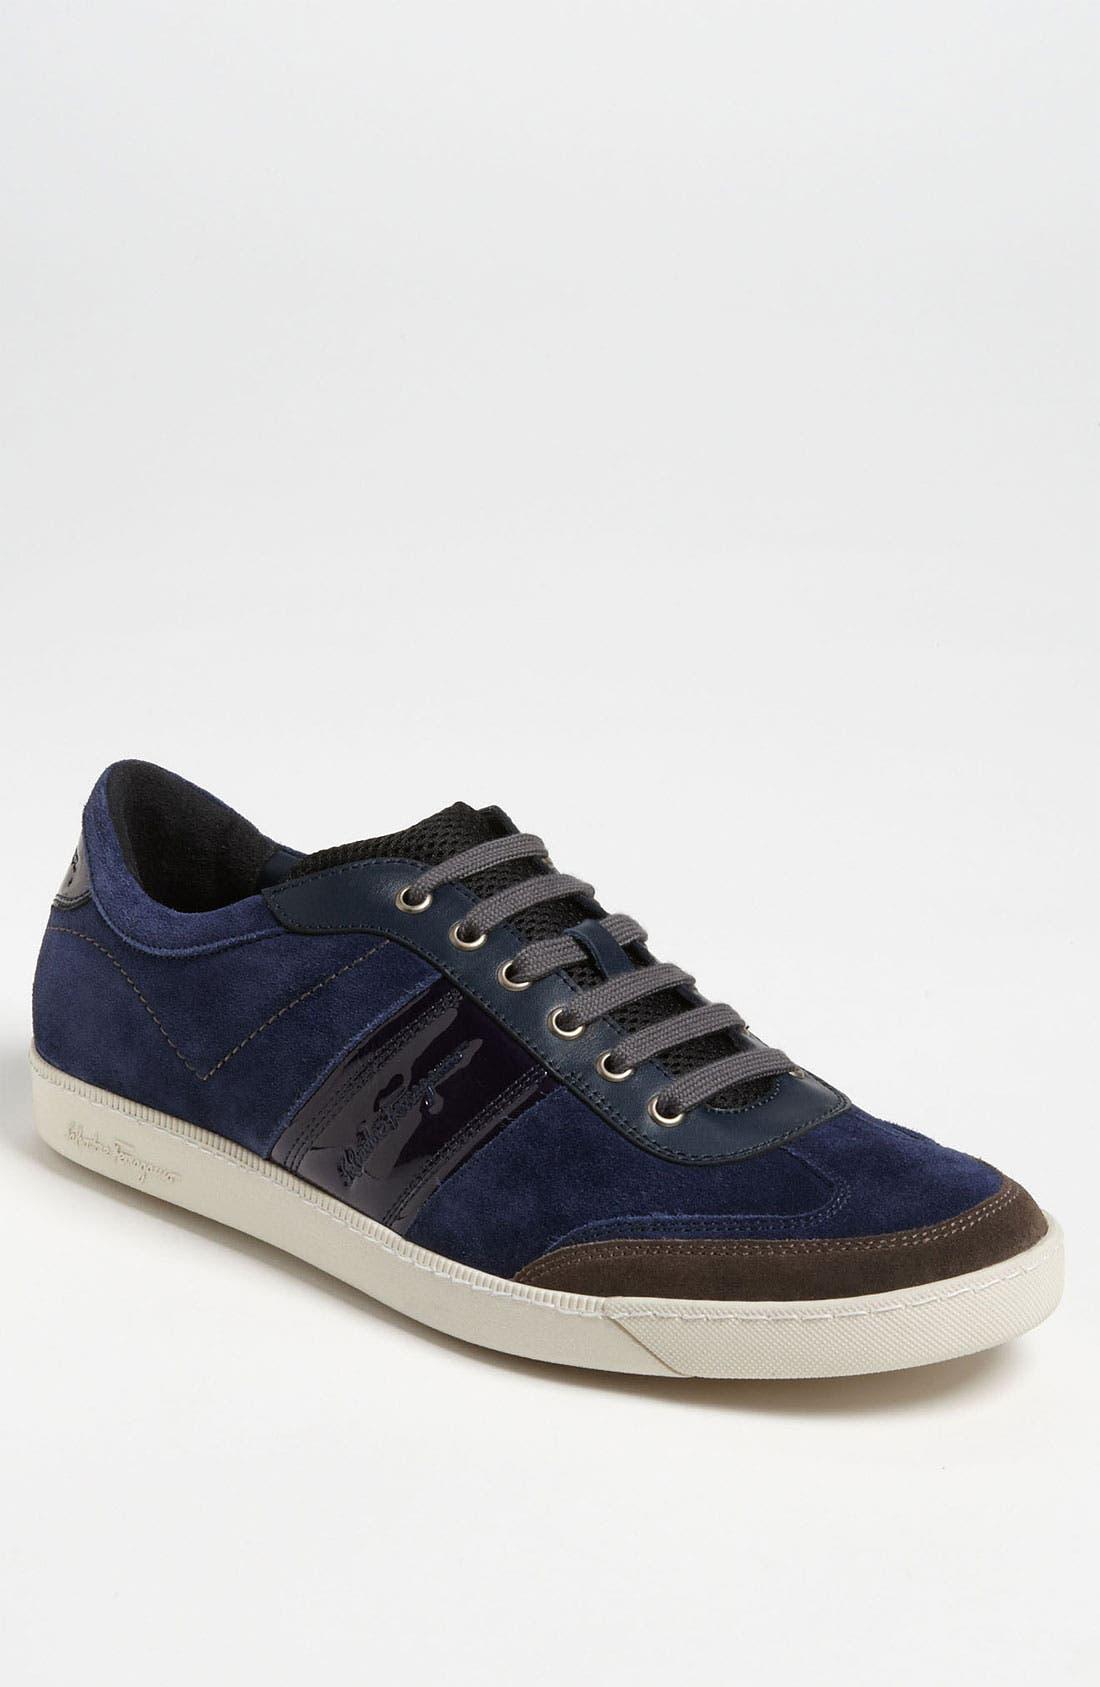 Main Image - Salvatore Ferragamo 'Marling' Sneaker